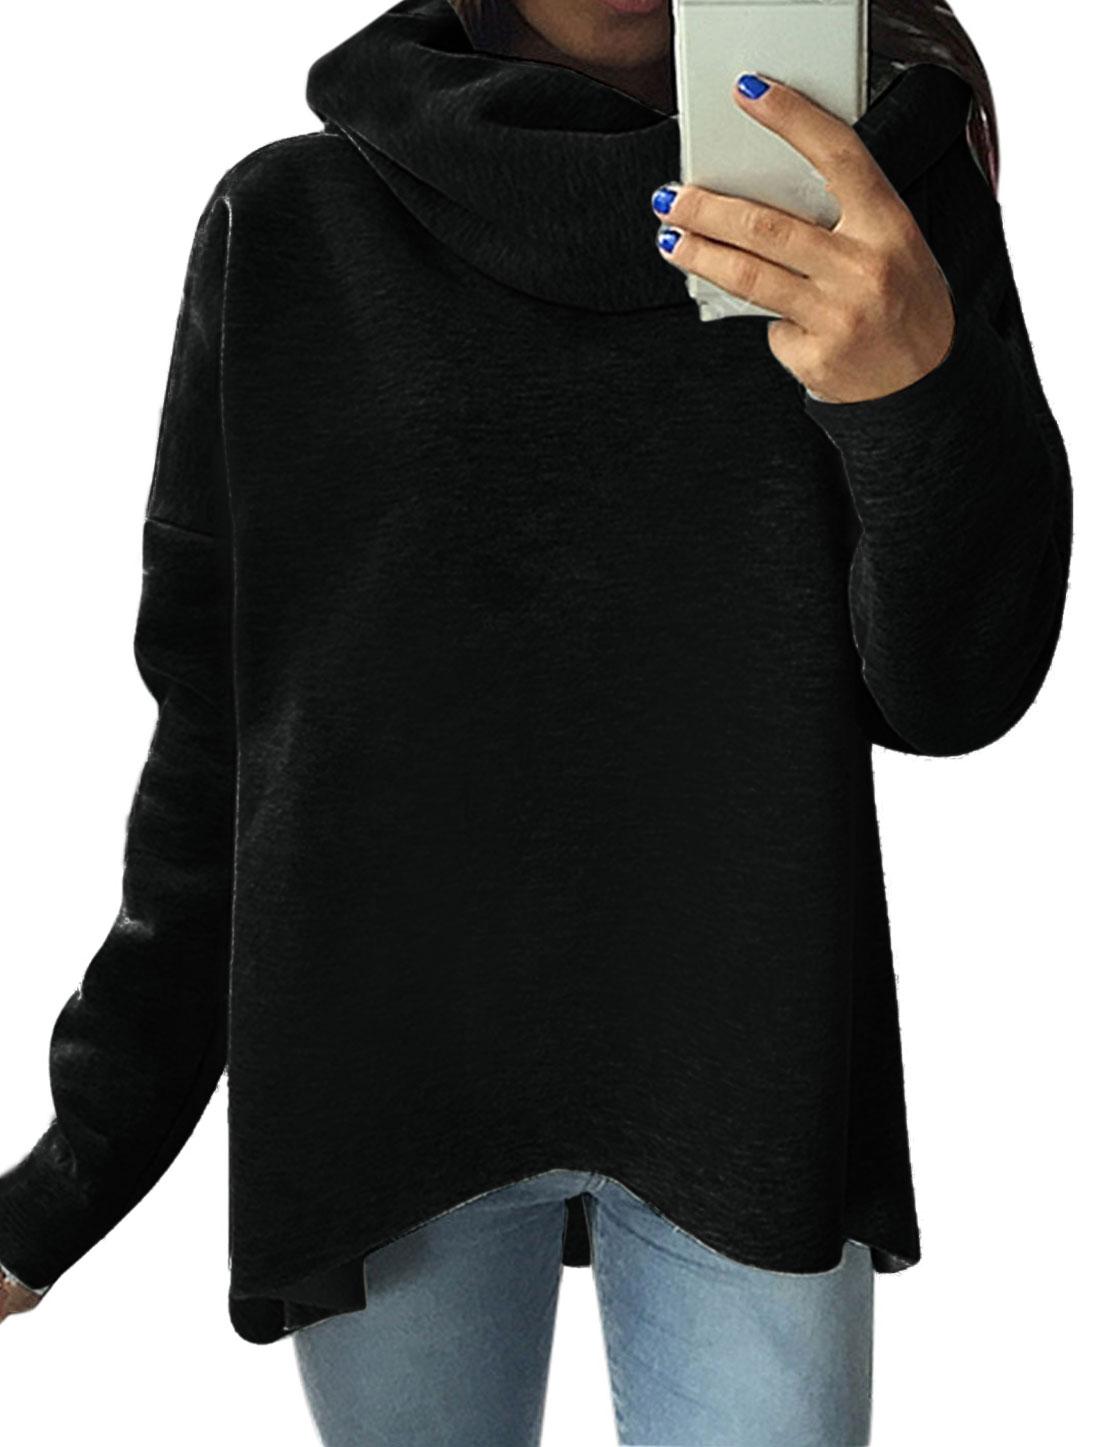 Women Cowl Neck Dolman Sleeves Hi-Lo Sweatshirt Black S